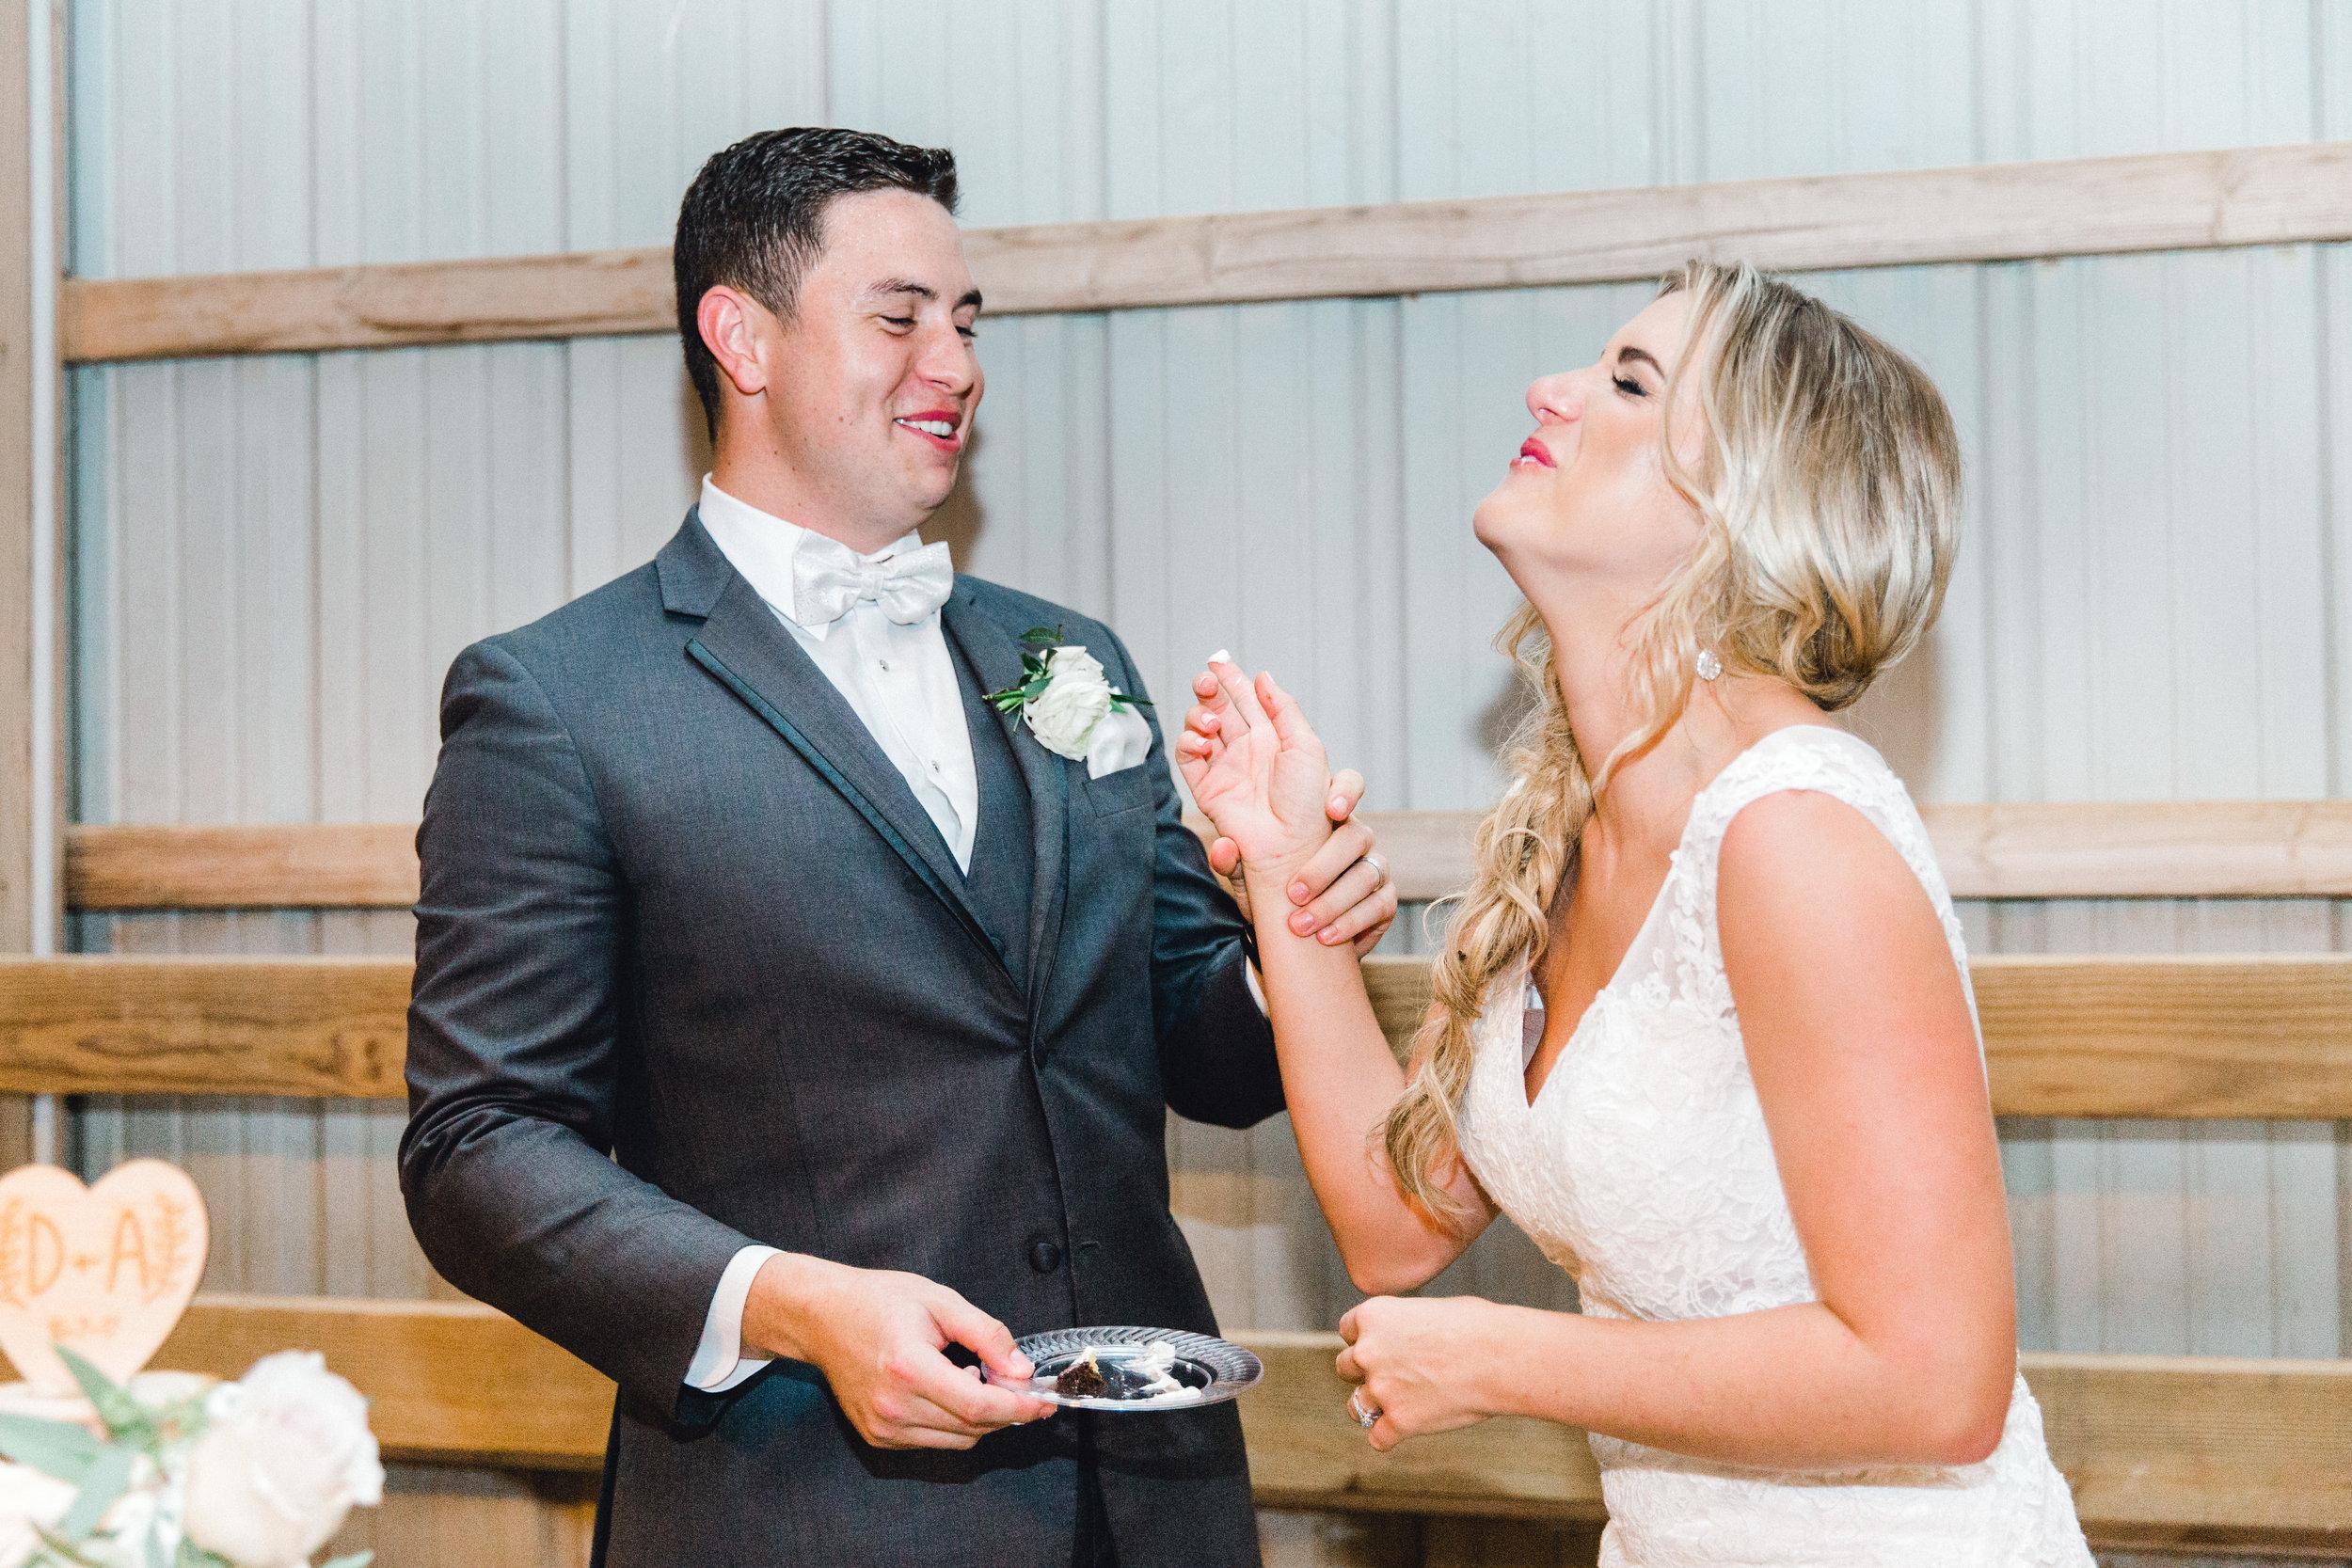 Paige-Mercer-Photography-Florida-Wedding-Photographer-Alyssa&Drew-89.jpg